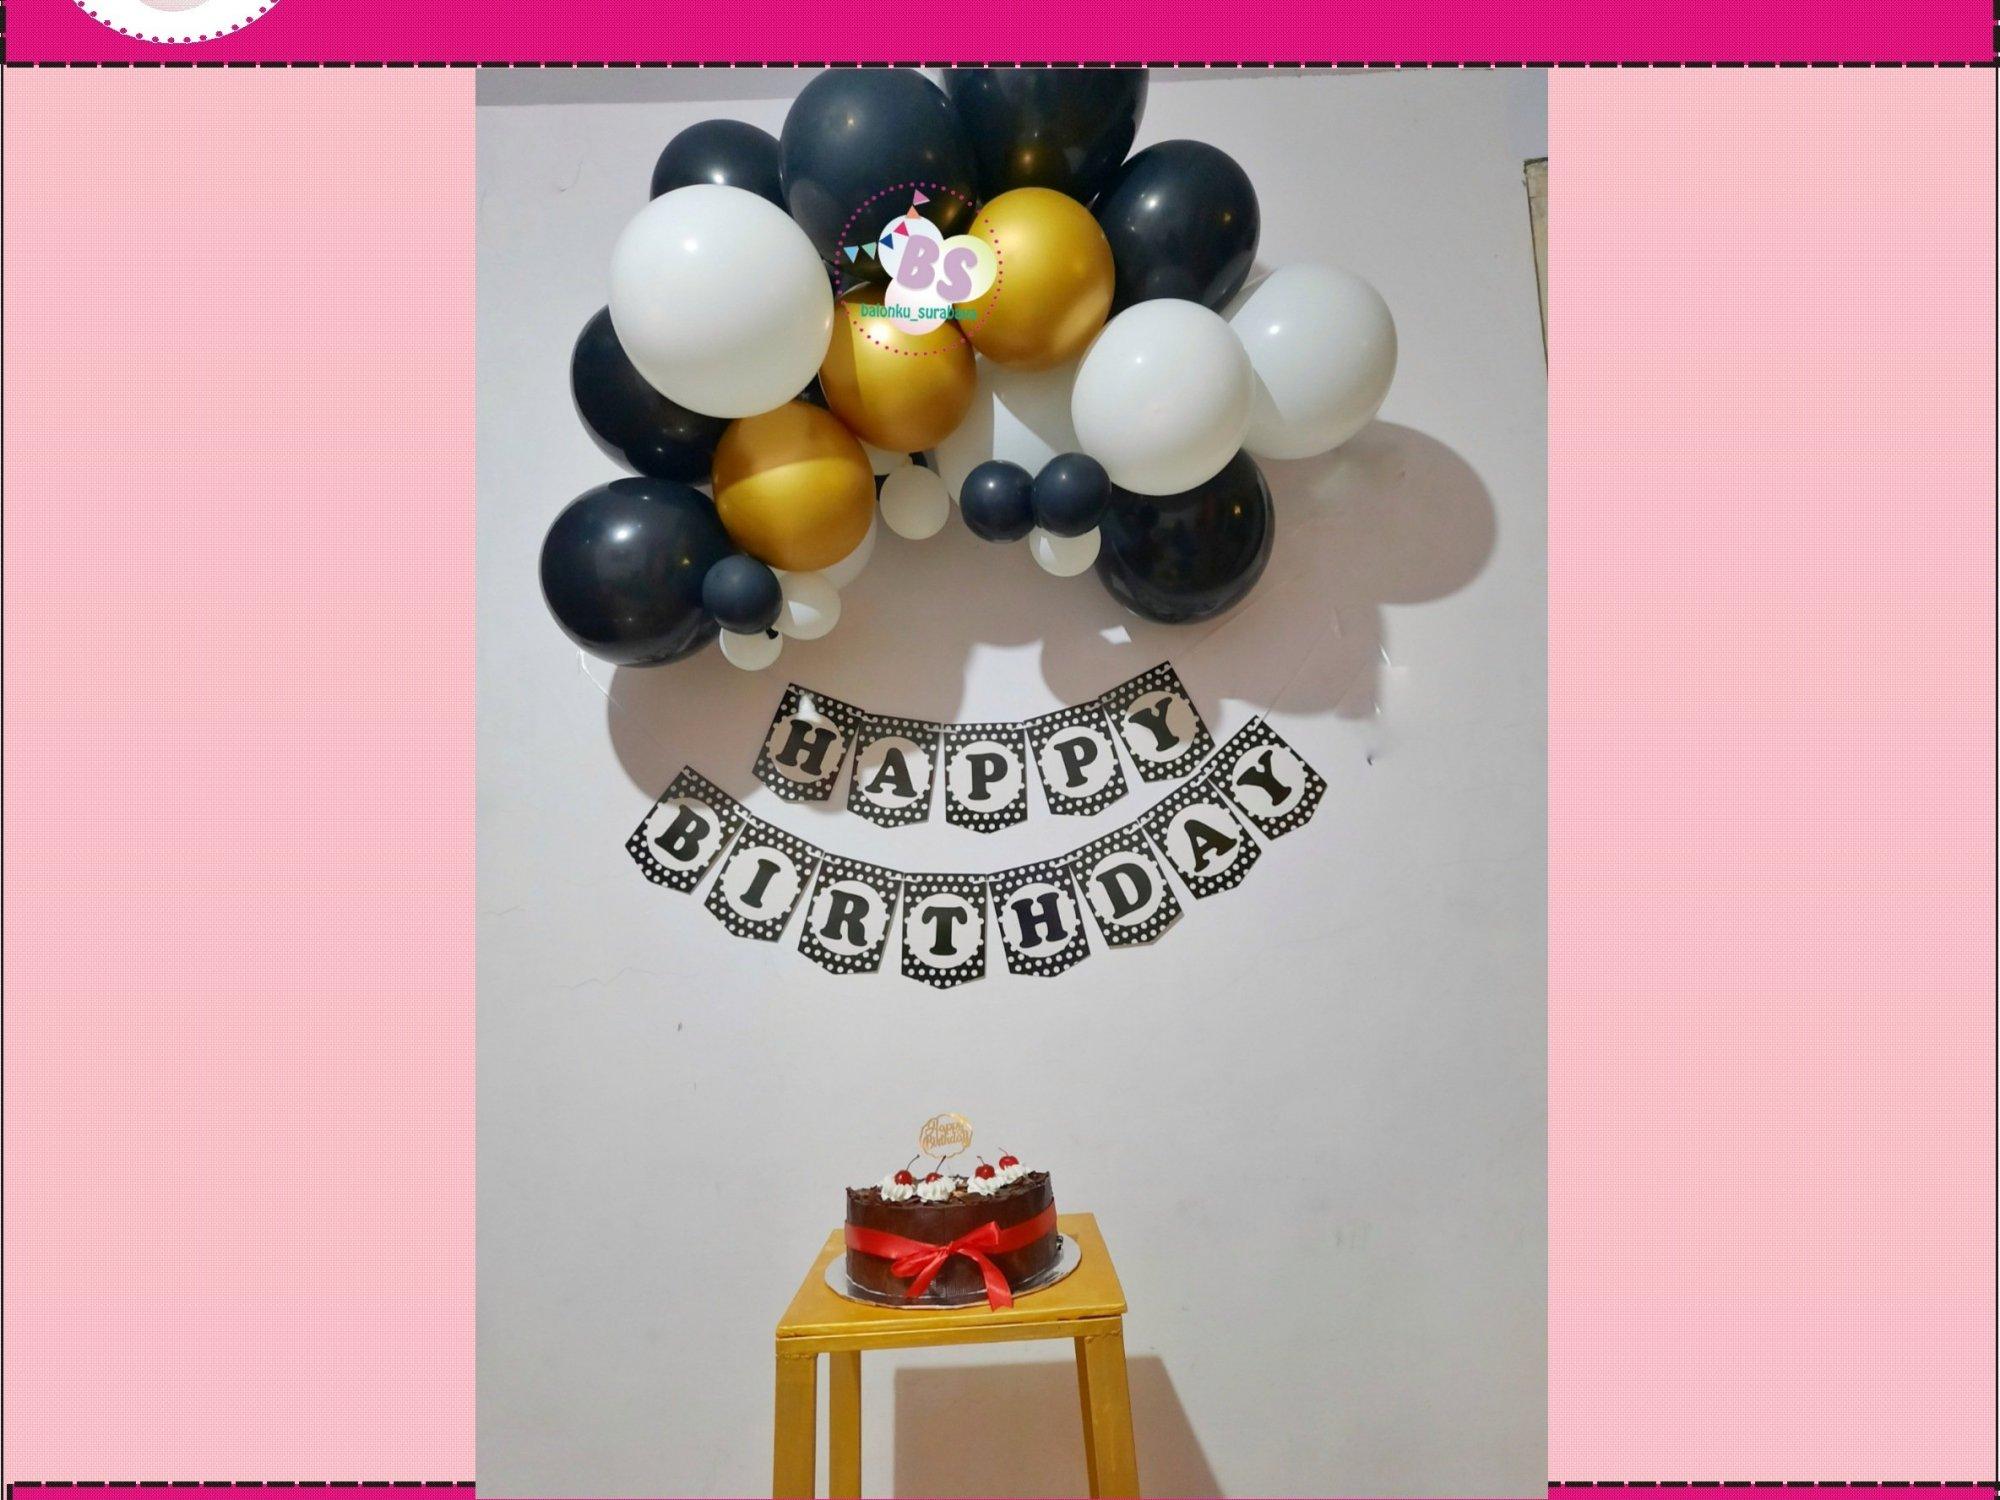 garland balon, garland balon, parcel balon ucapan, parcel balon ucapan, parcel balon ucapan warna pink, balon bentuk bunga, standing balon custom, balon ucapan ulang tahun anak, balon ucapan ulang tahun warna merah, balon ucapan ulang tahun merah, balon ucapan ulang tahun anak balon ucapan warna peach, baln ucapan box coklat, jual balon latex twist hijau emerald, BAlon Gas,Bunga dekorasi,Rangkaian bunga artificial, Buket bunga, buket bunga mawar, harga buket bunga,Balon sablon, balon Printing, balon promosi, Perlengkapan ulang tahun, Balon latex , balon doff, balon natal, balon agustusan, balon dekorasi, balonku Surabaya, 085733133529